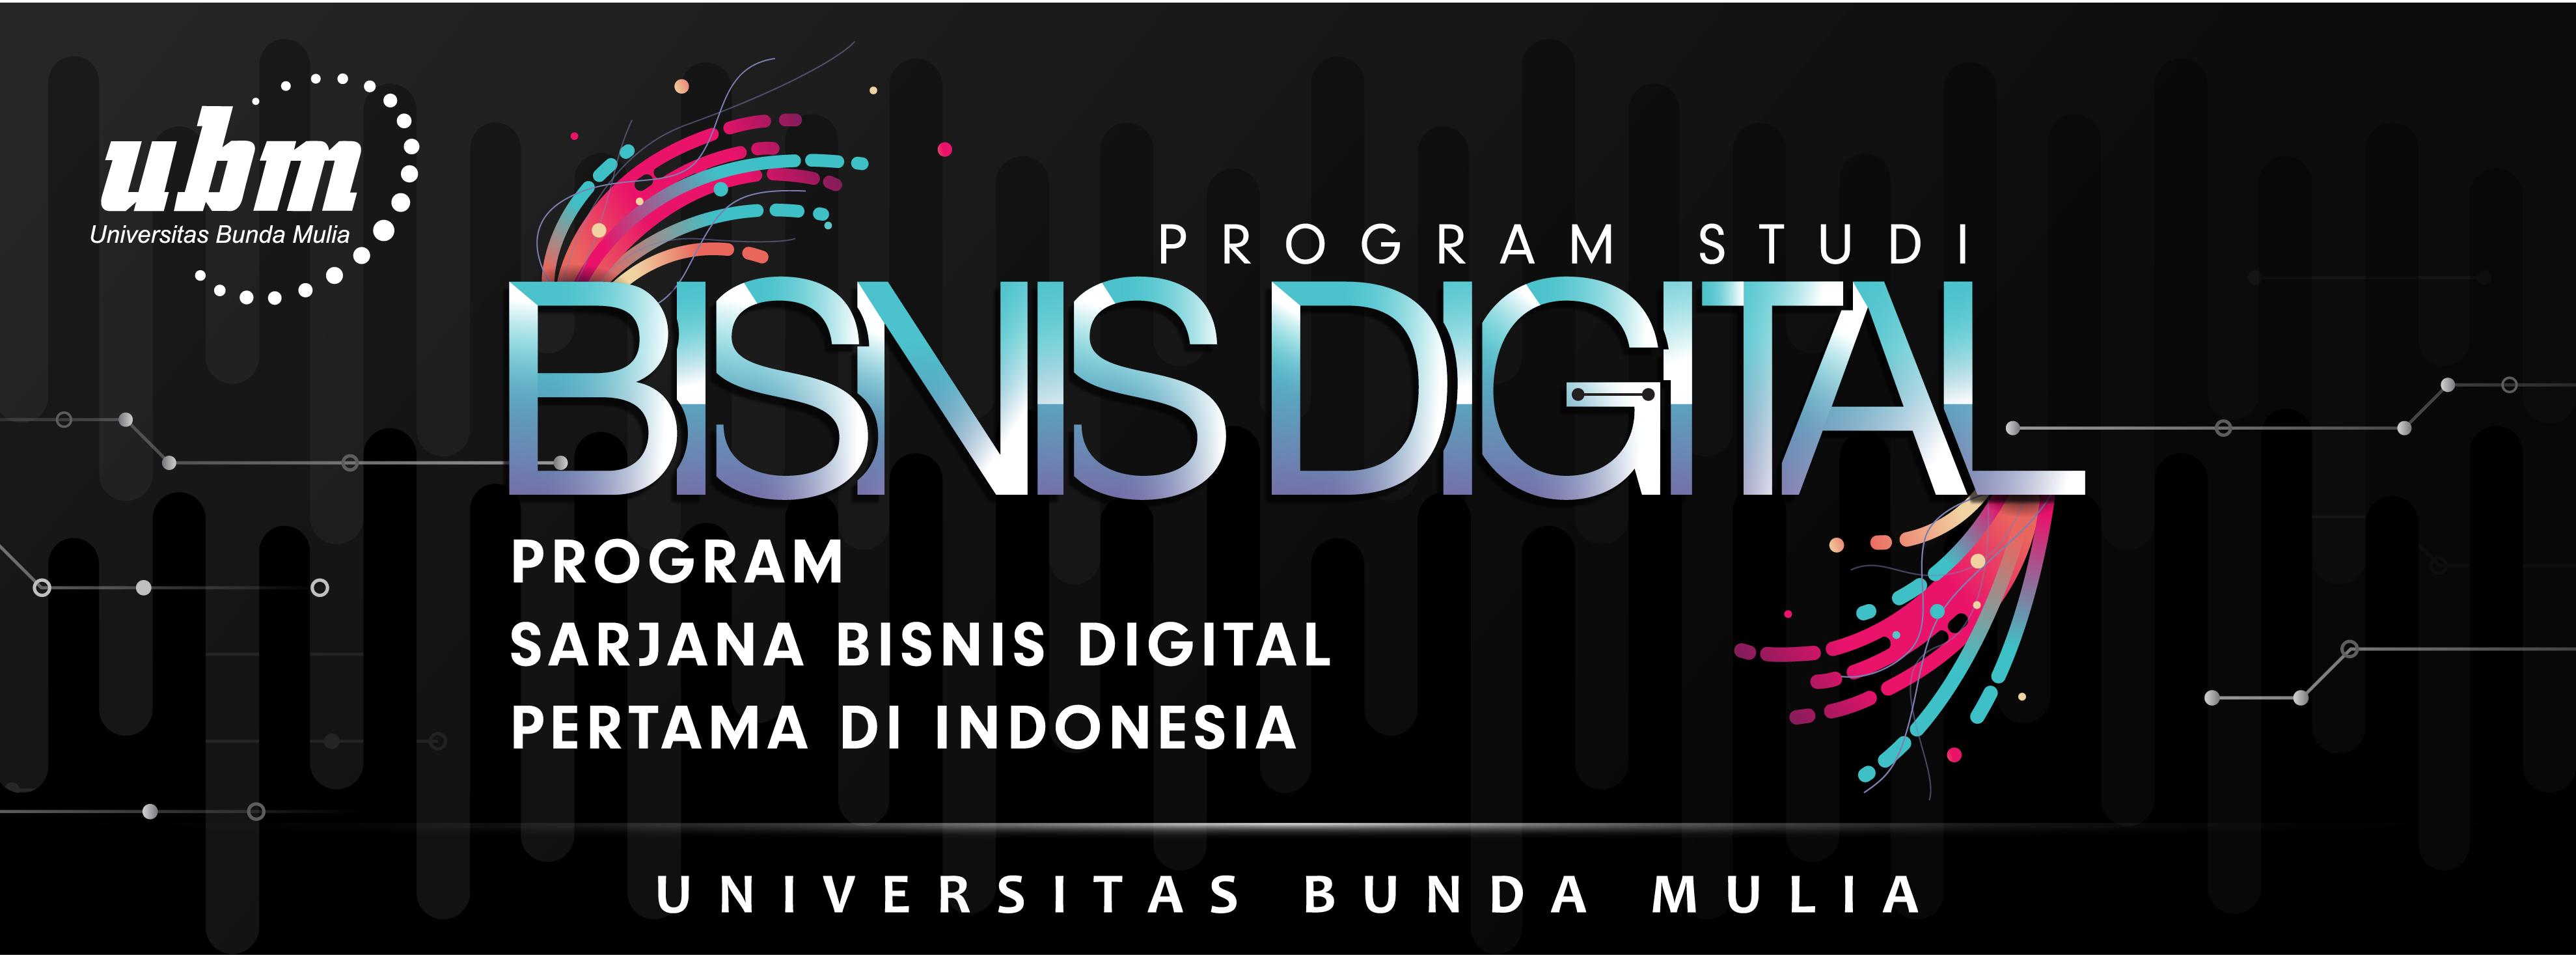 DB-Instastory-2019-02